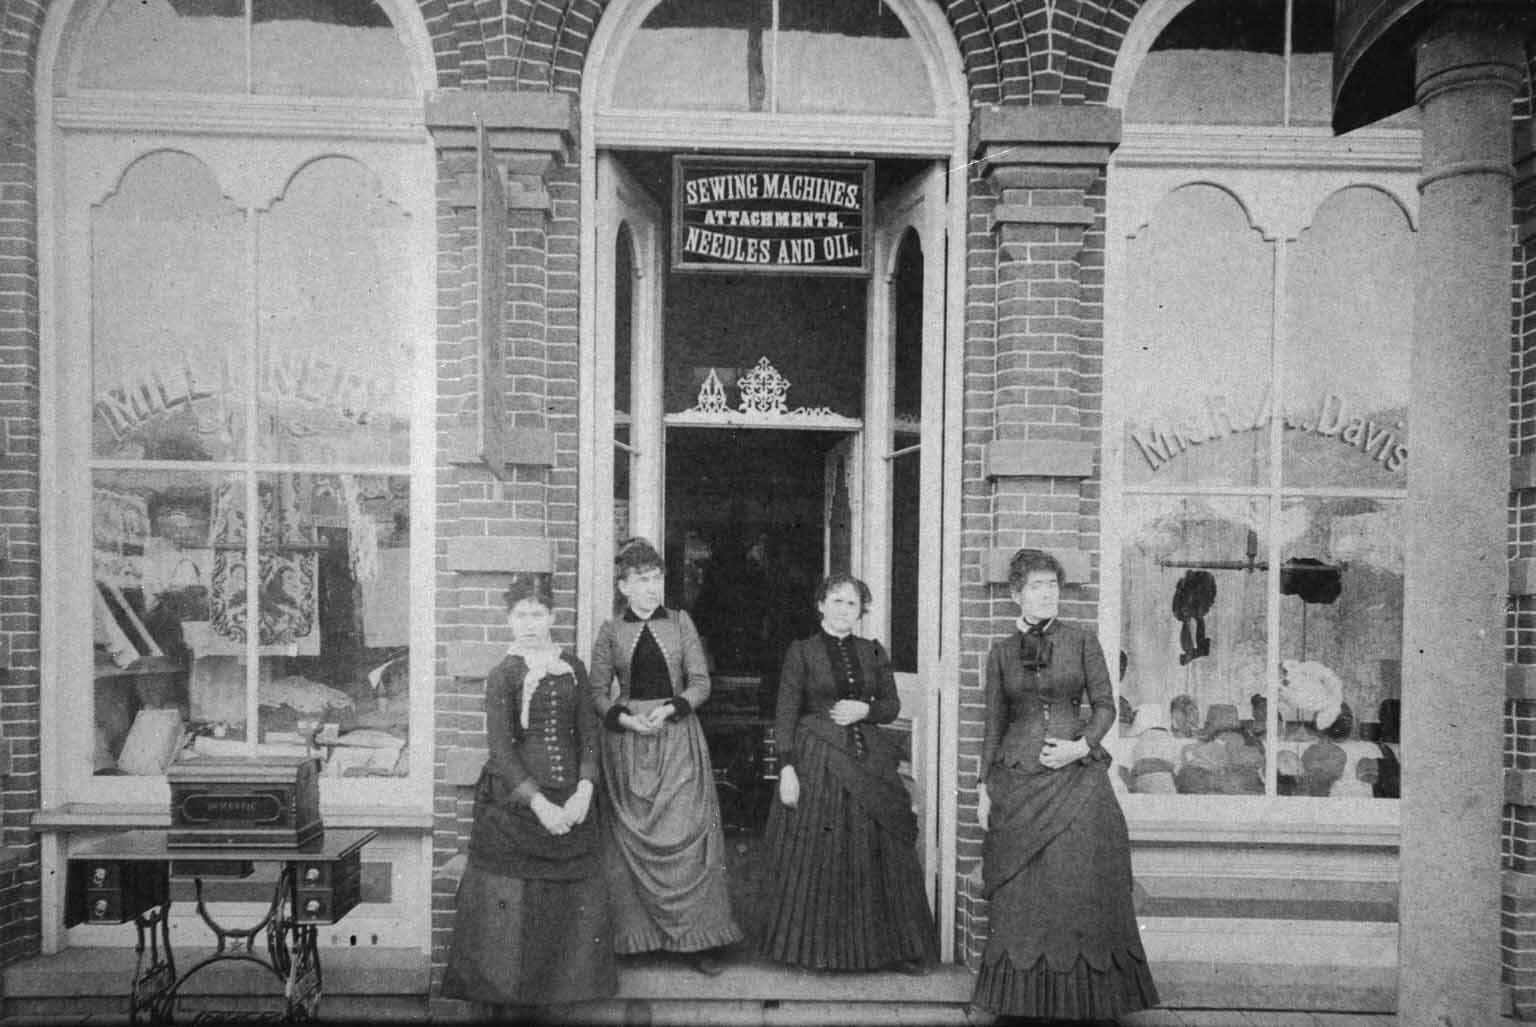 Mrs. R. A. Davis Millinery Shop 61d023a2179